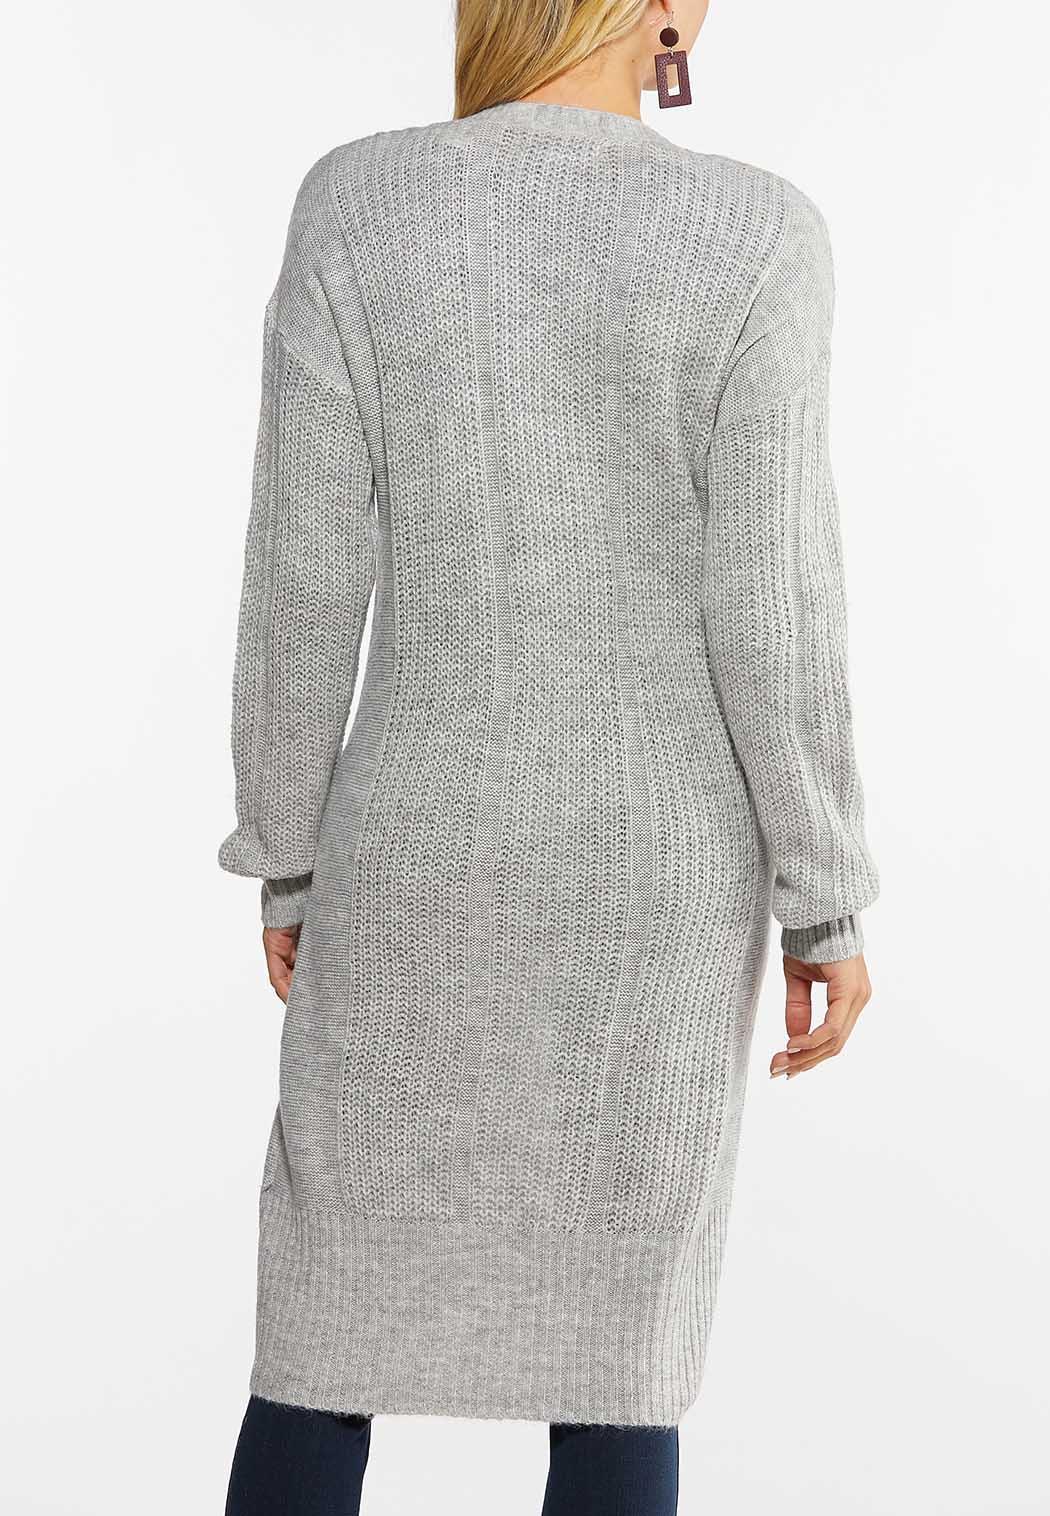 Plus Size Gray Cardigan Sweater (Item #44431074)